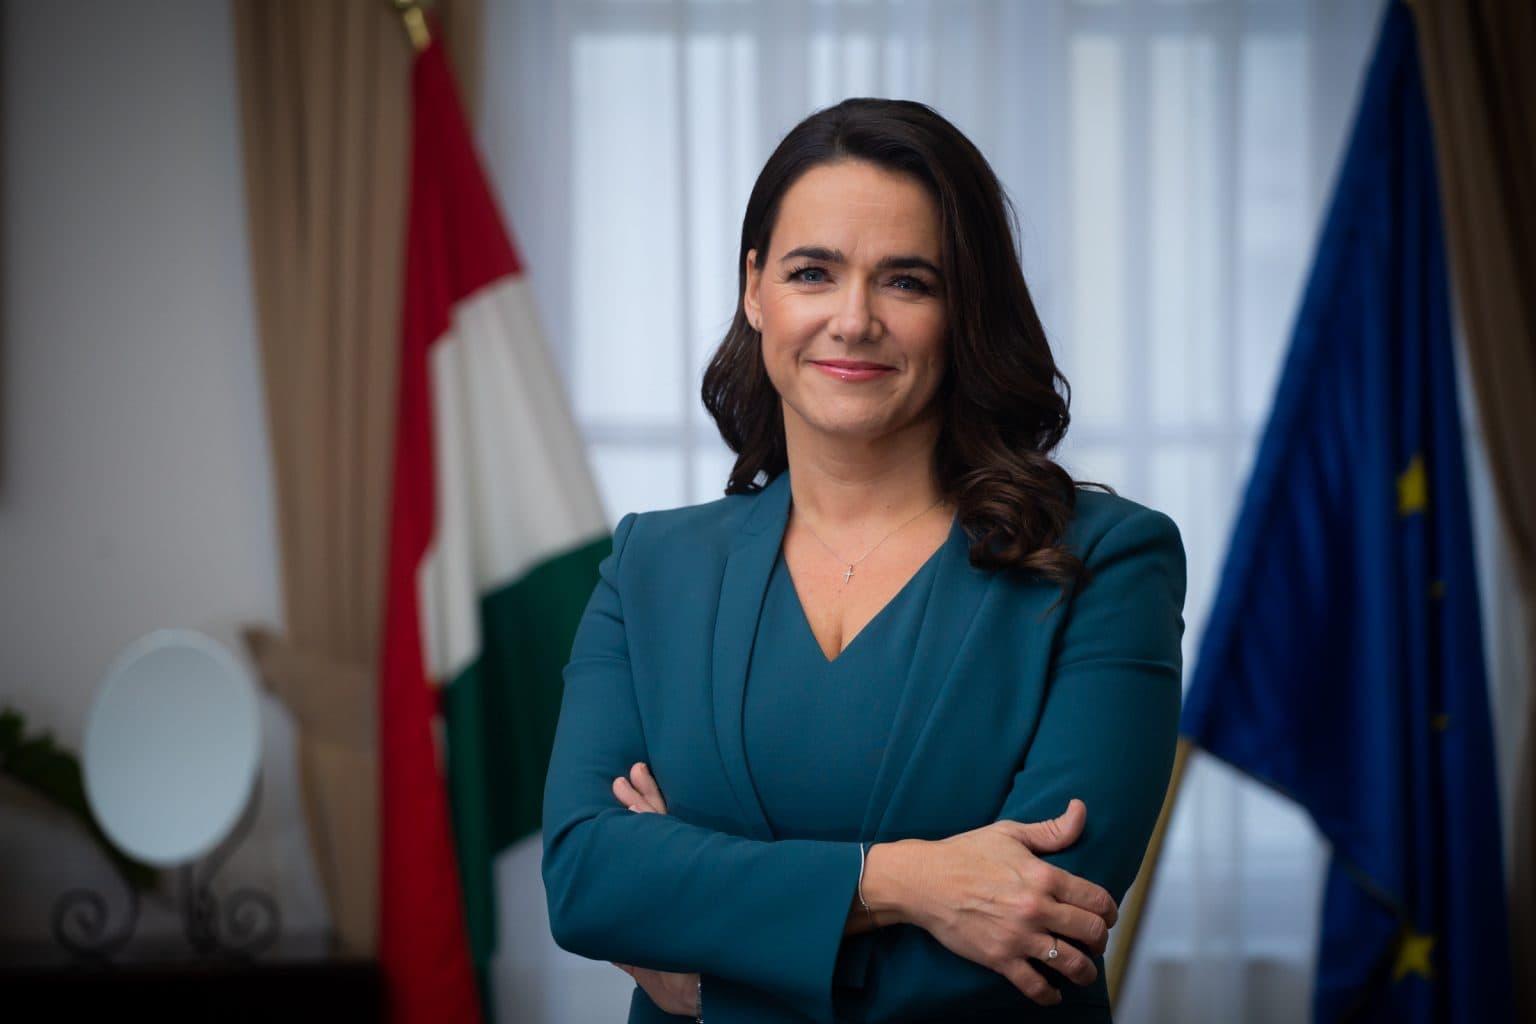 Katalin Novak es la ministra de Familia de Hungría